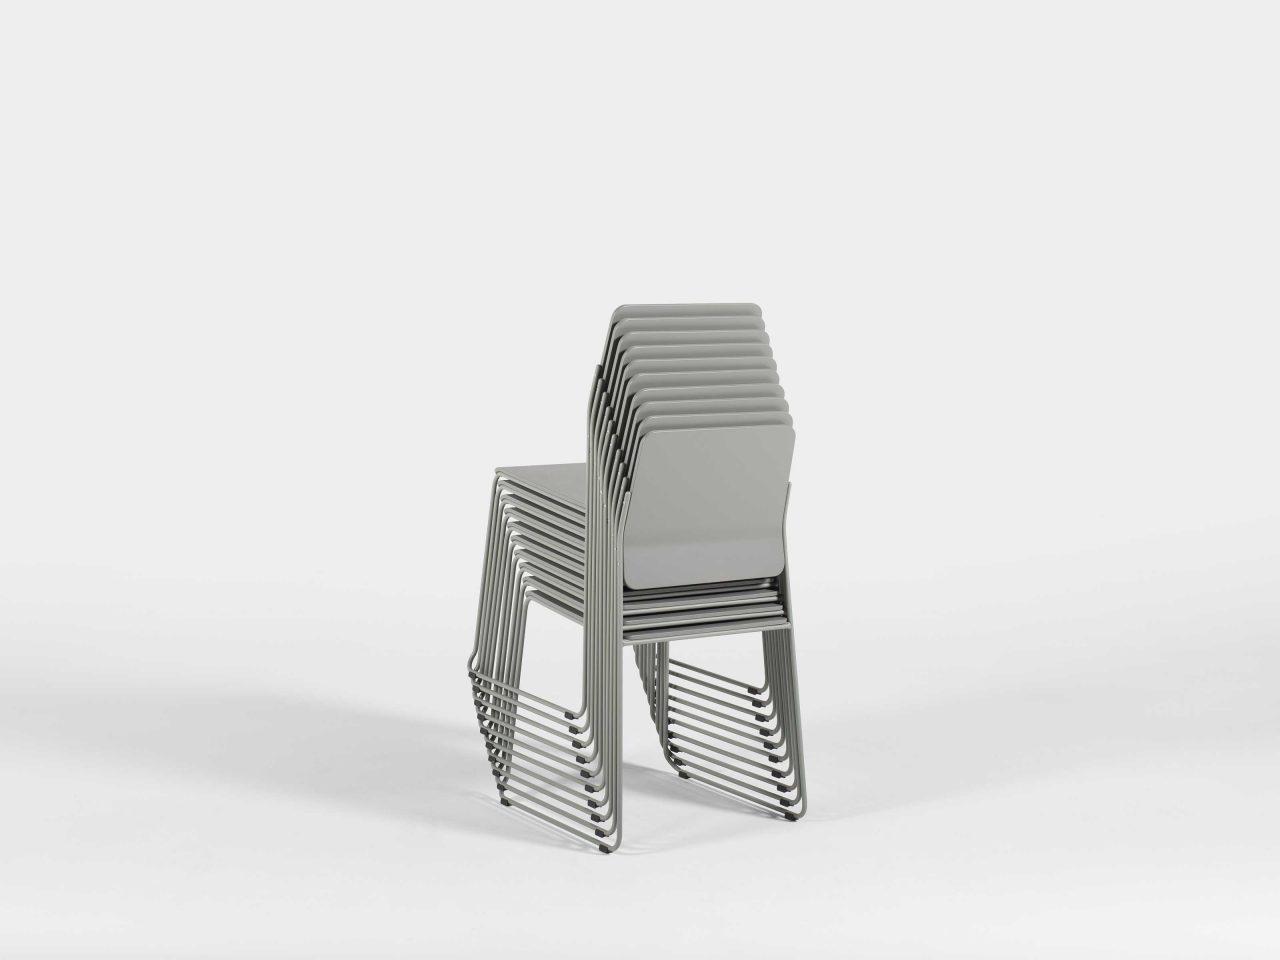 Montoya_Chair_8_3200x2400